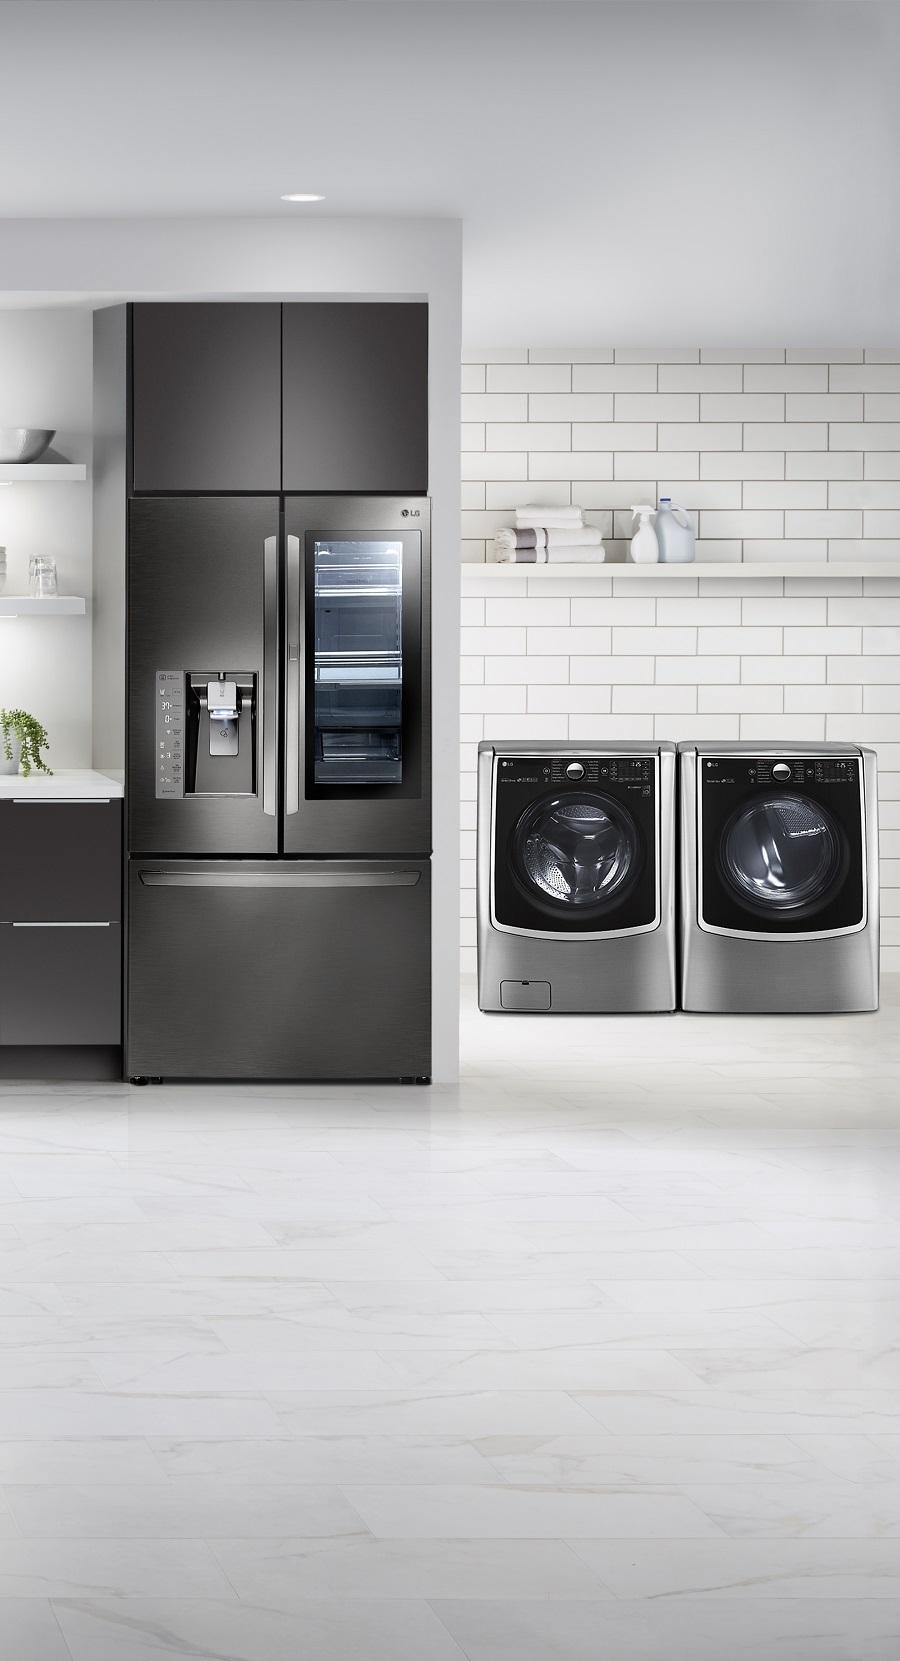 LG contemporary kitchen